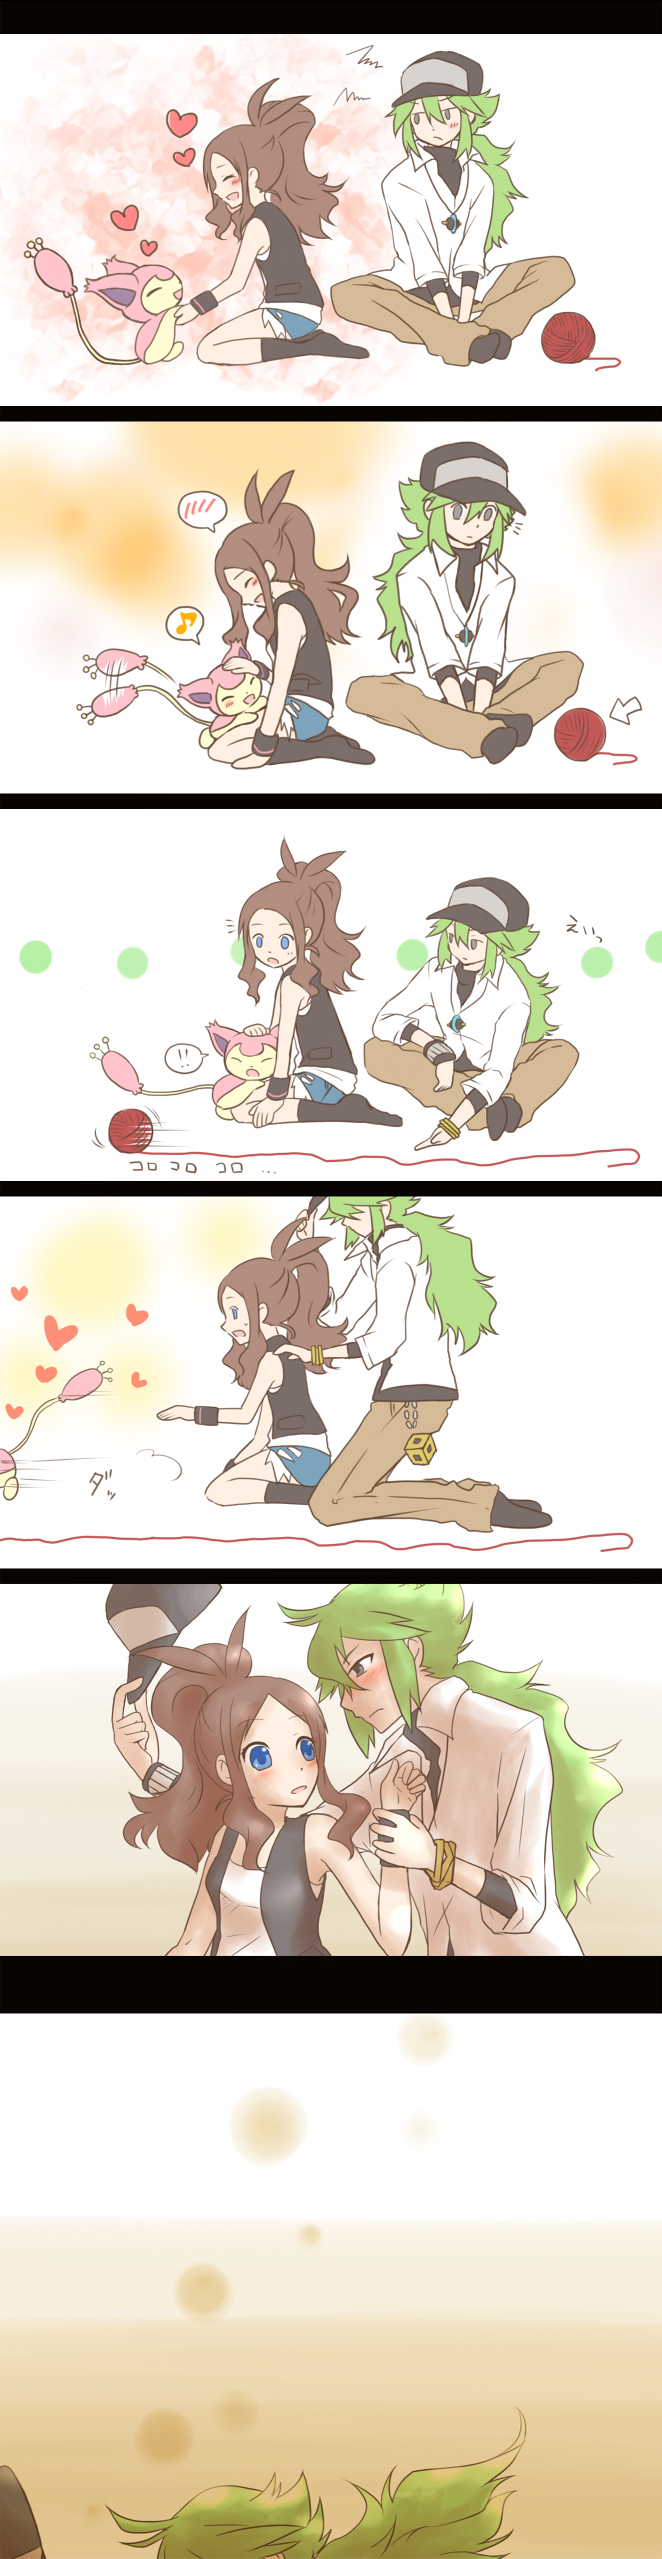 Tags: Anime, Pixiv Id 876020, Pokémon, Skitty, N (Pokémon), Touko (Pokémon), Jealousy, Ball of Yarn, PNG Conversion, Comic